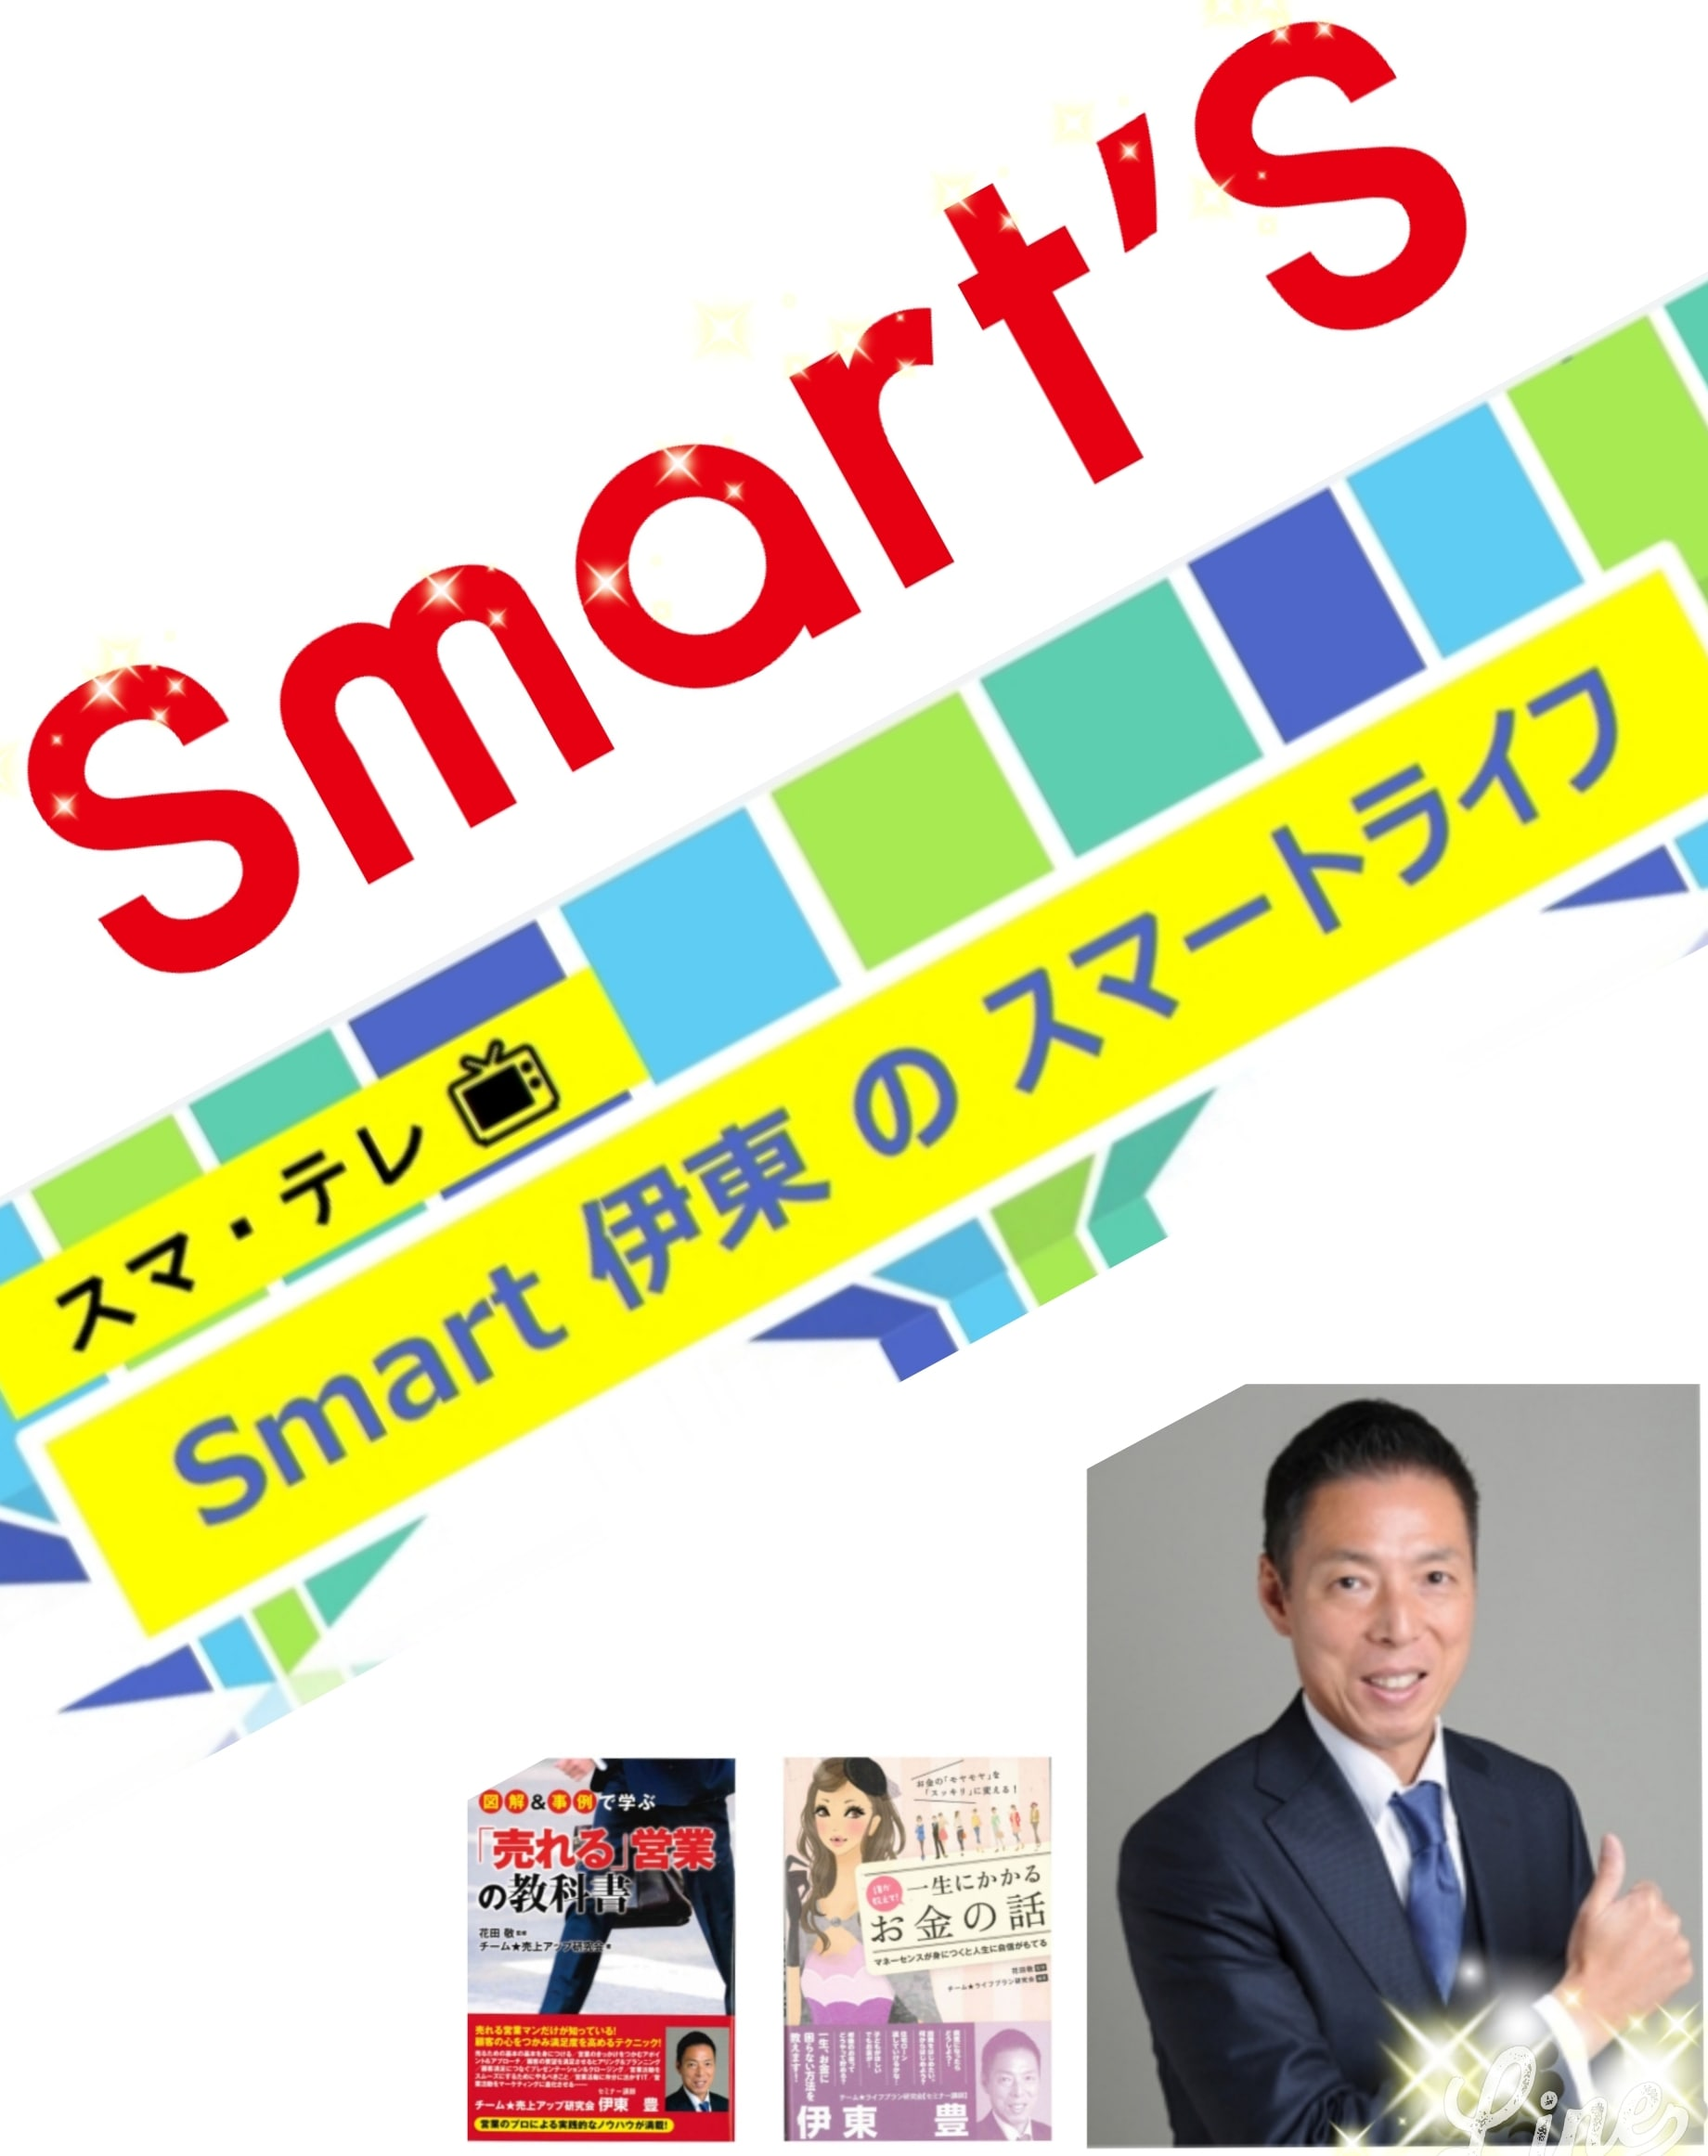 Smart伊東のスマートライフ